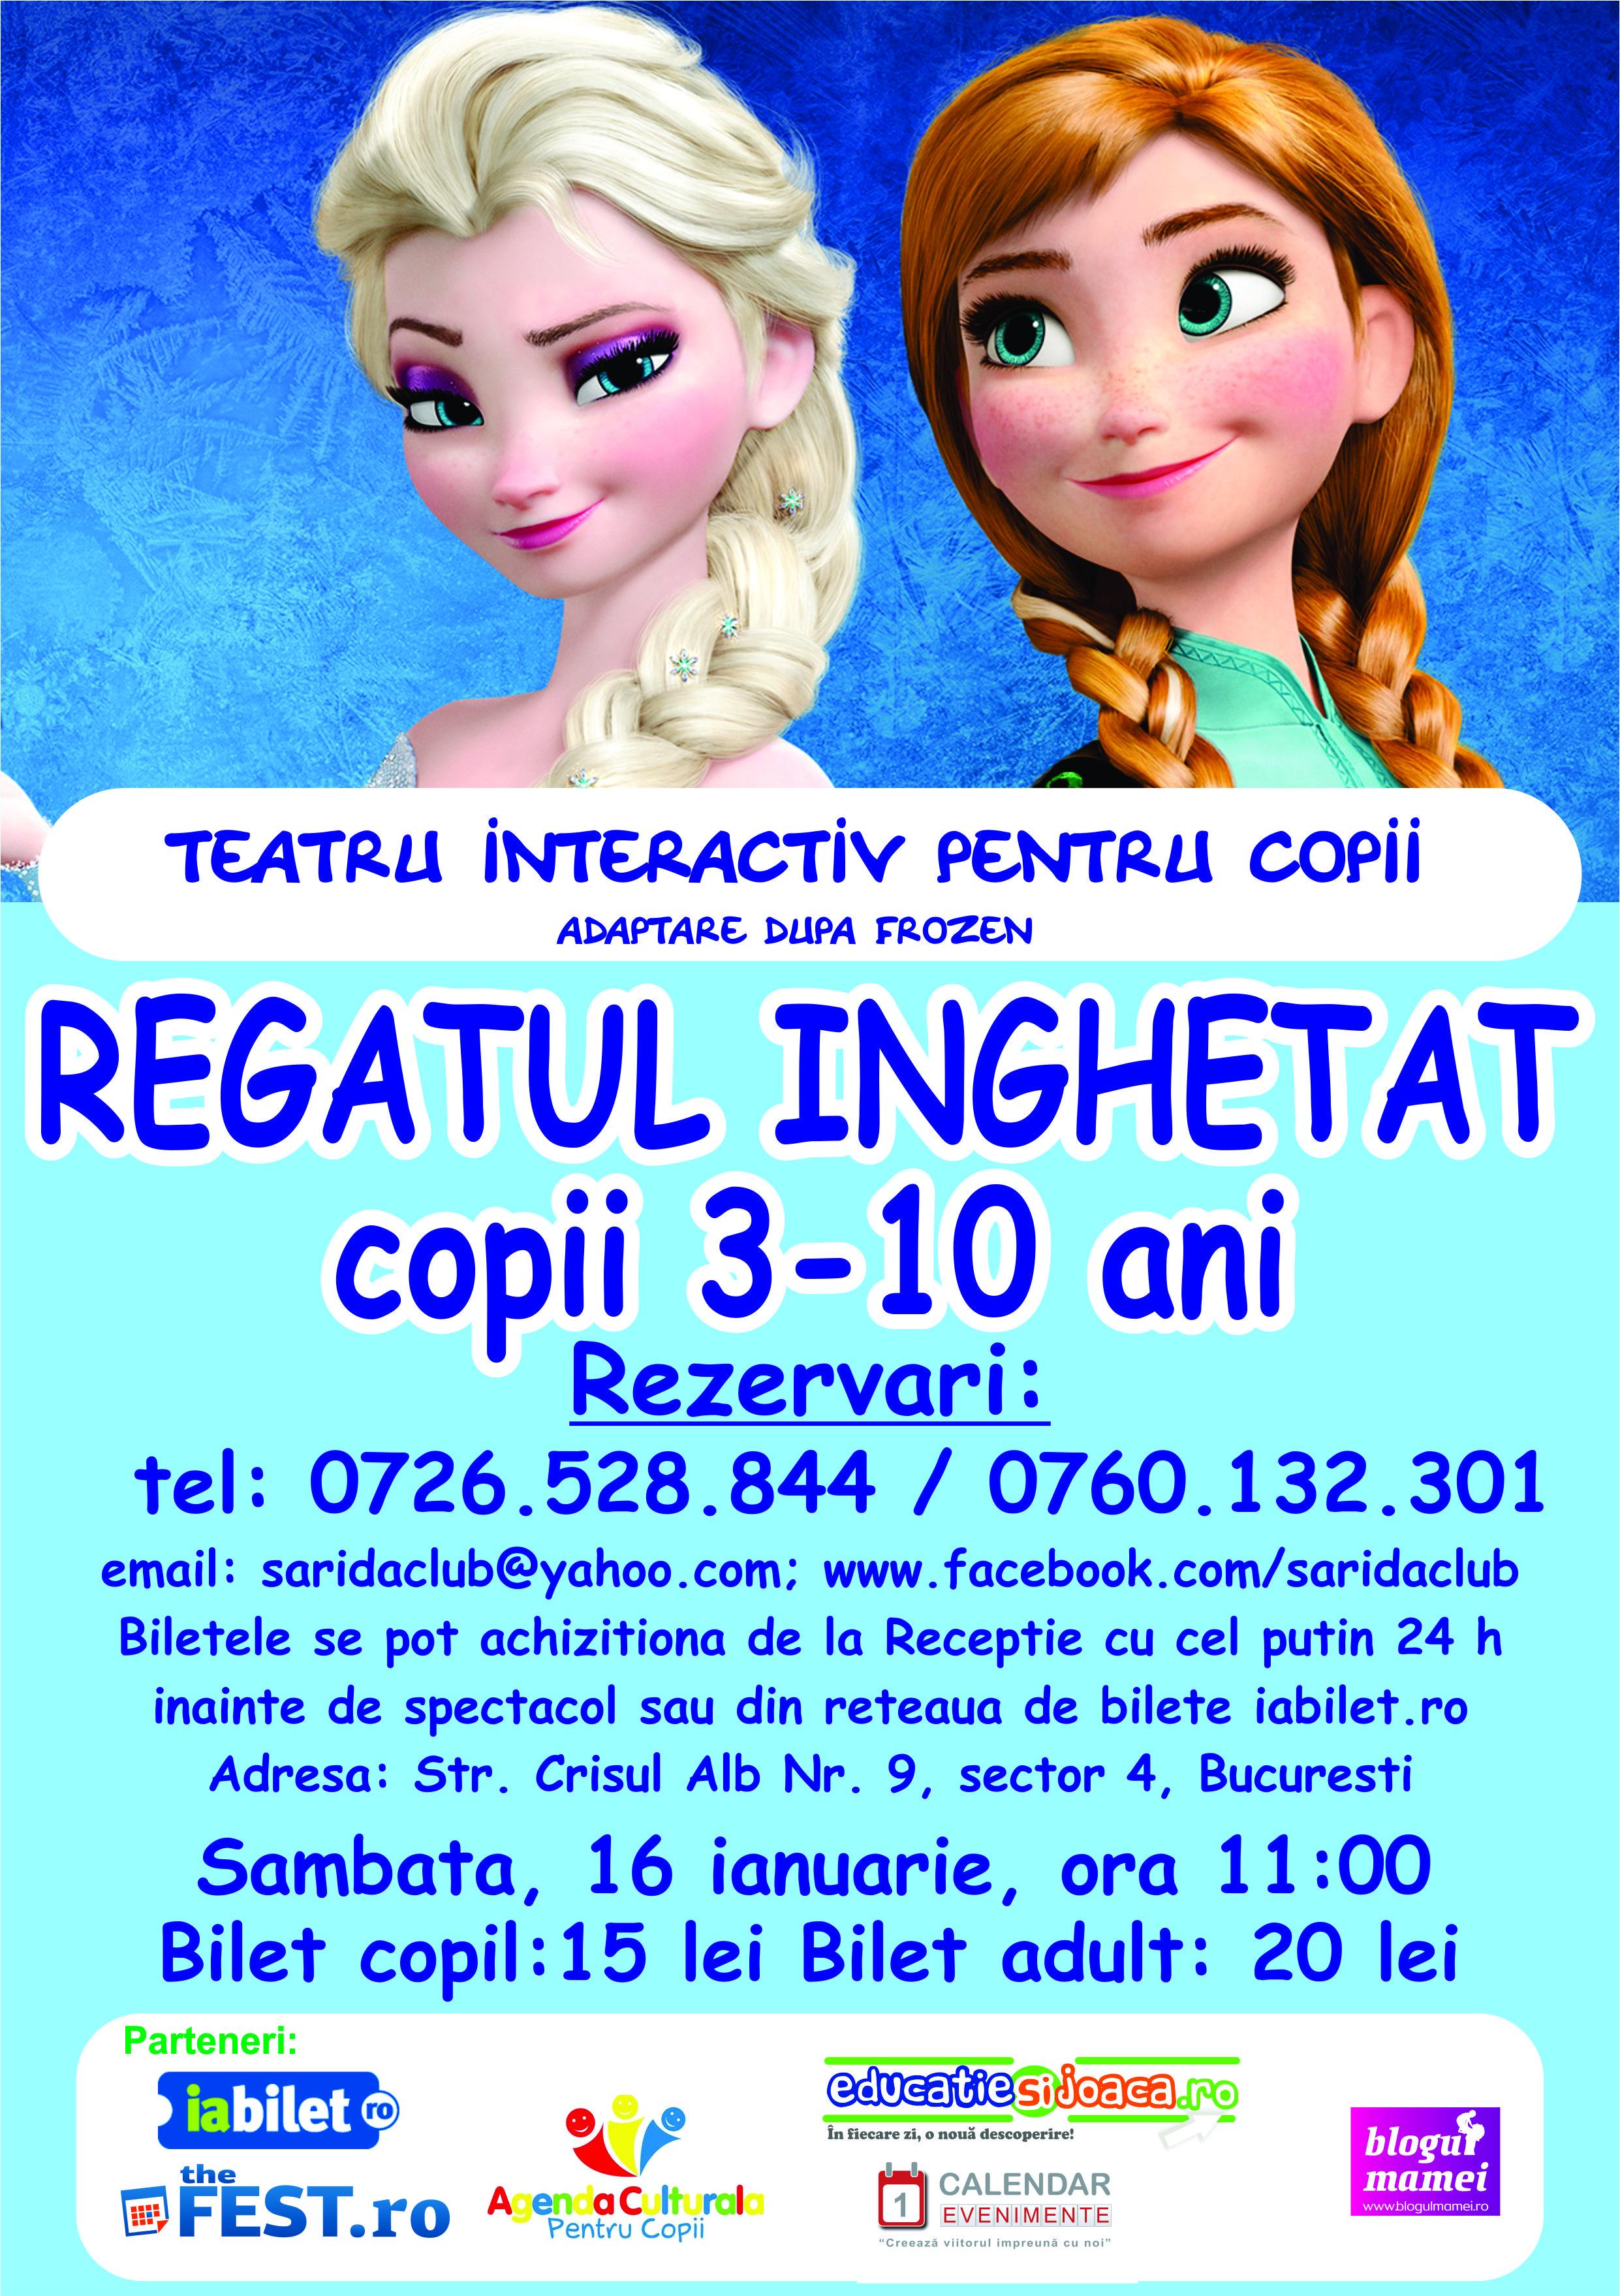 Spectacol de teatru interactiv Frozen 16 ianuarie 2016